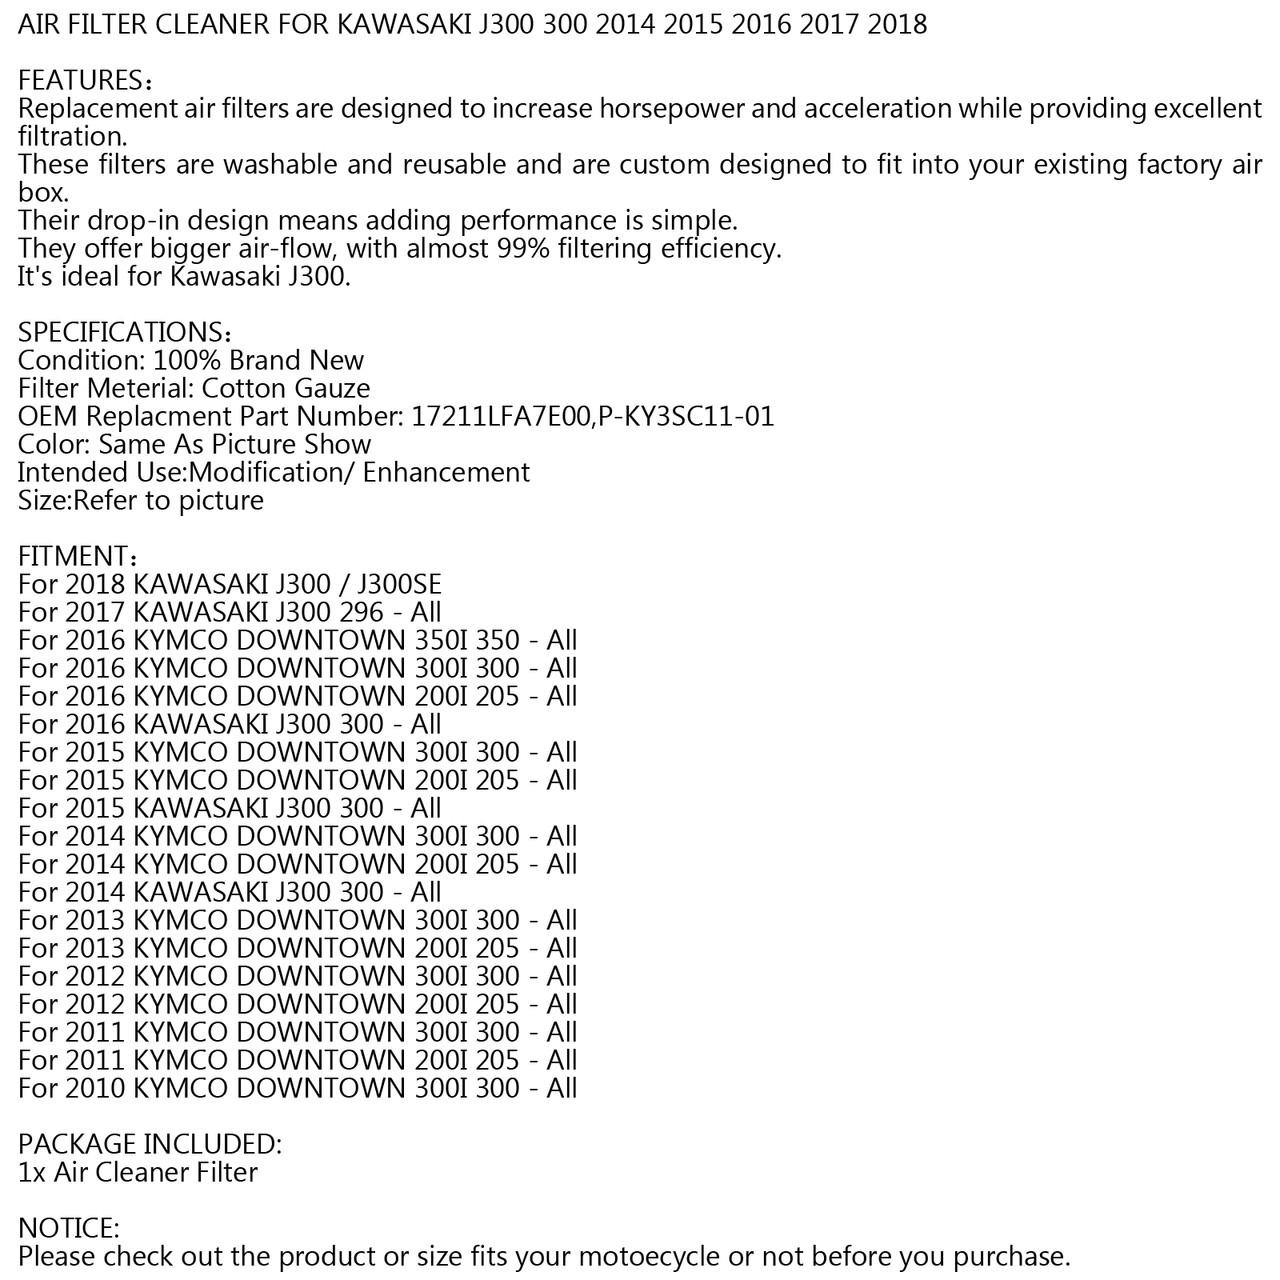 Air Filter for 2018 KAWASAKI J300 296 300, J300SE,Purple